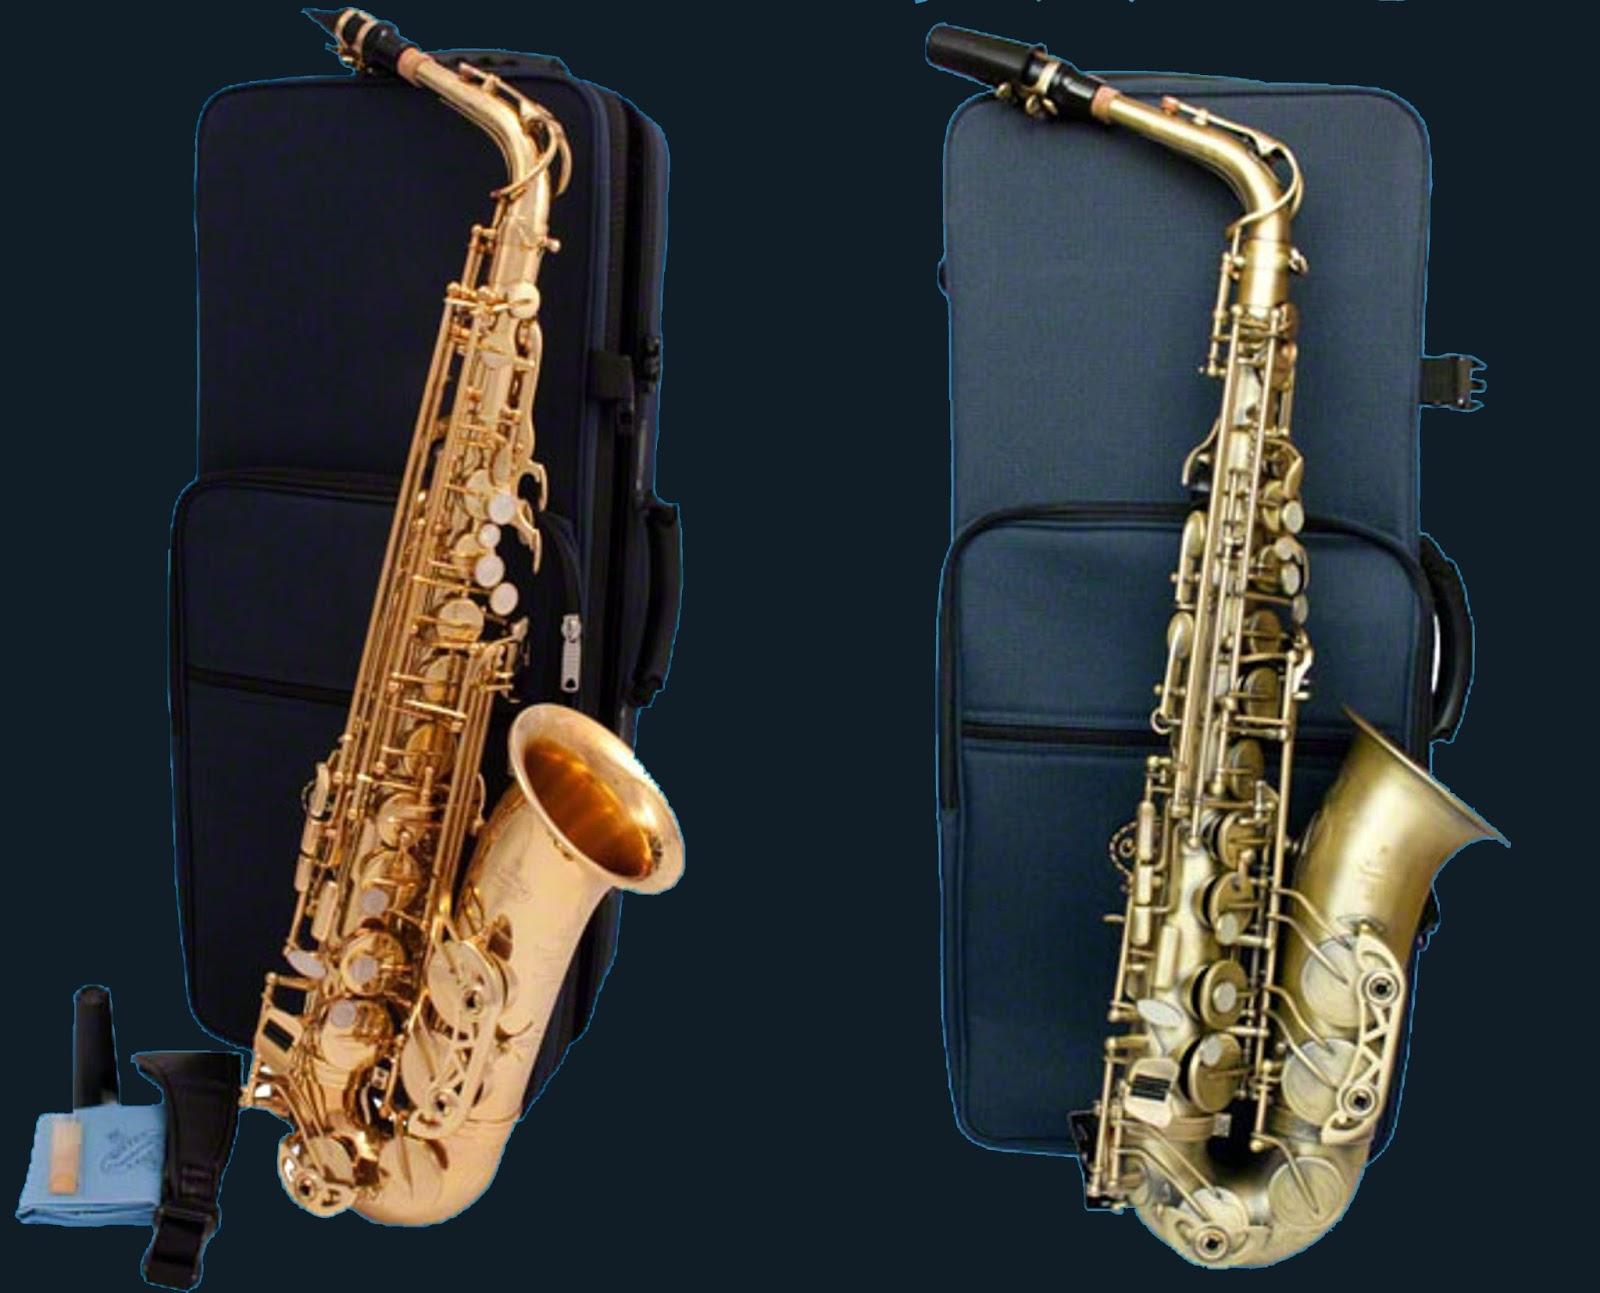 Surprising The Saxophone Corner Saxophone Review Buffet 400 Alto Sax Download Free Architecture Designs Intelgarnamadebymaigaardcom